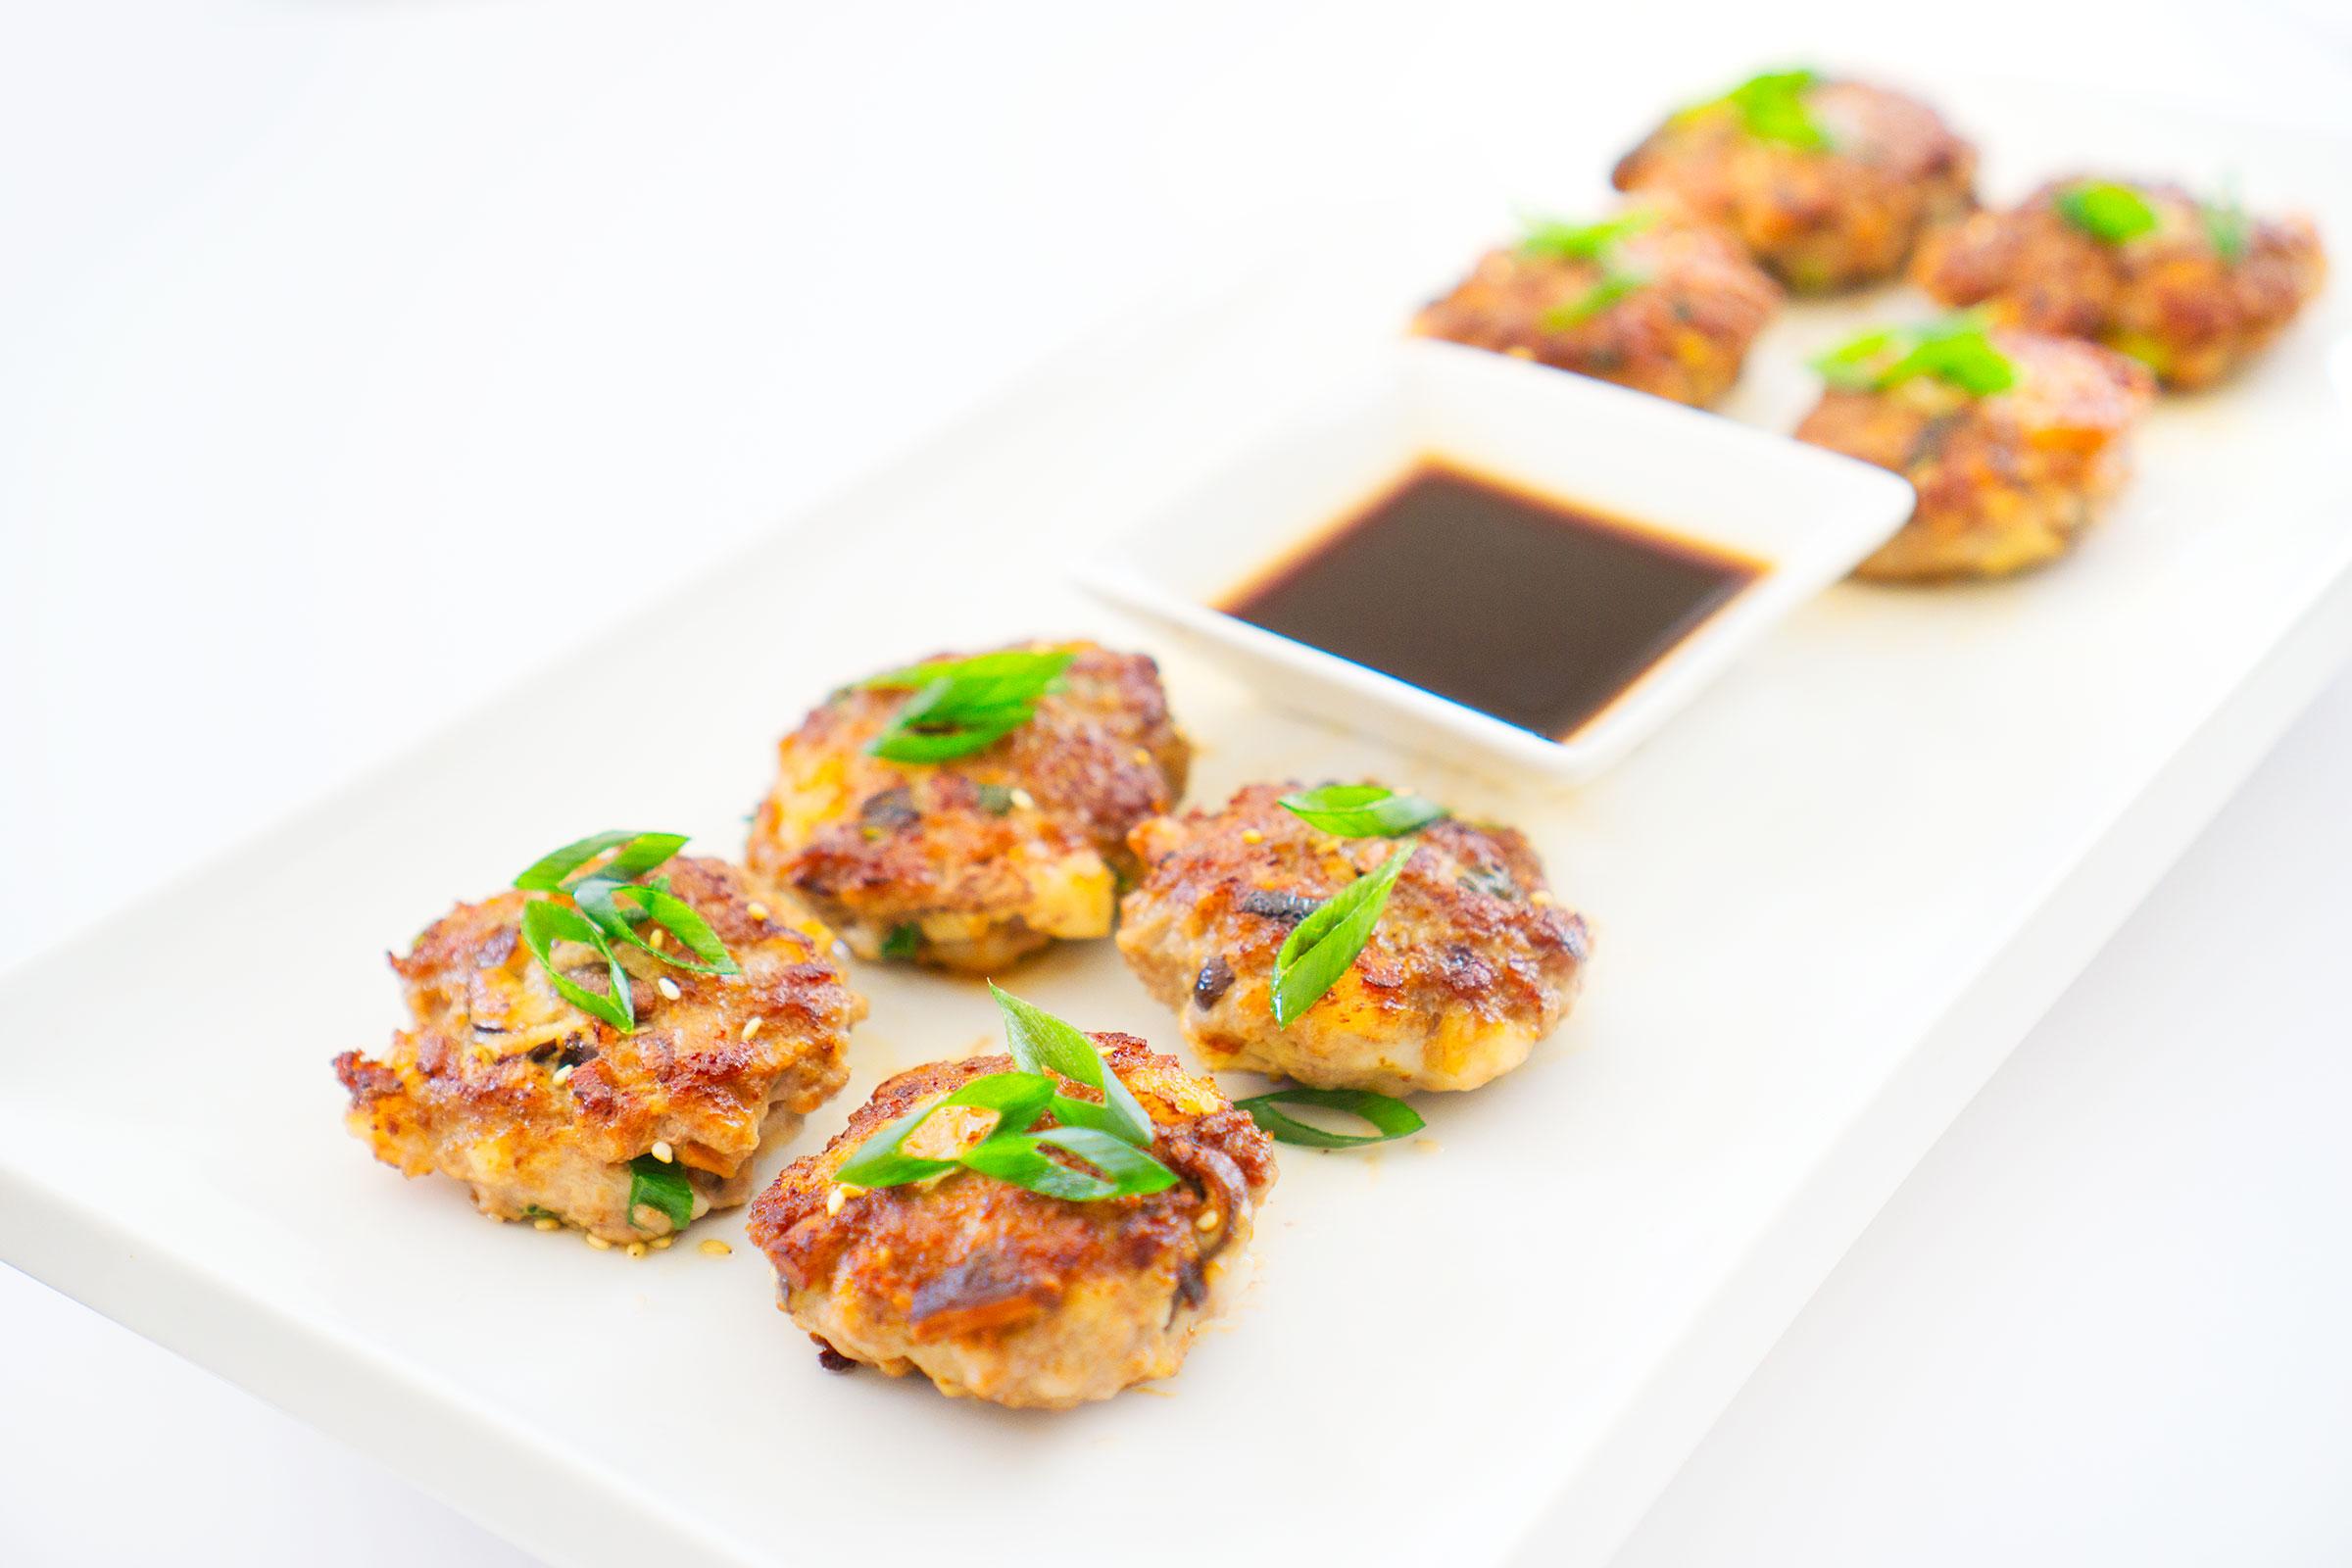 Keto Pan-Fried Wonton Dumplings